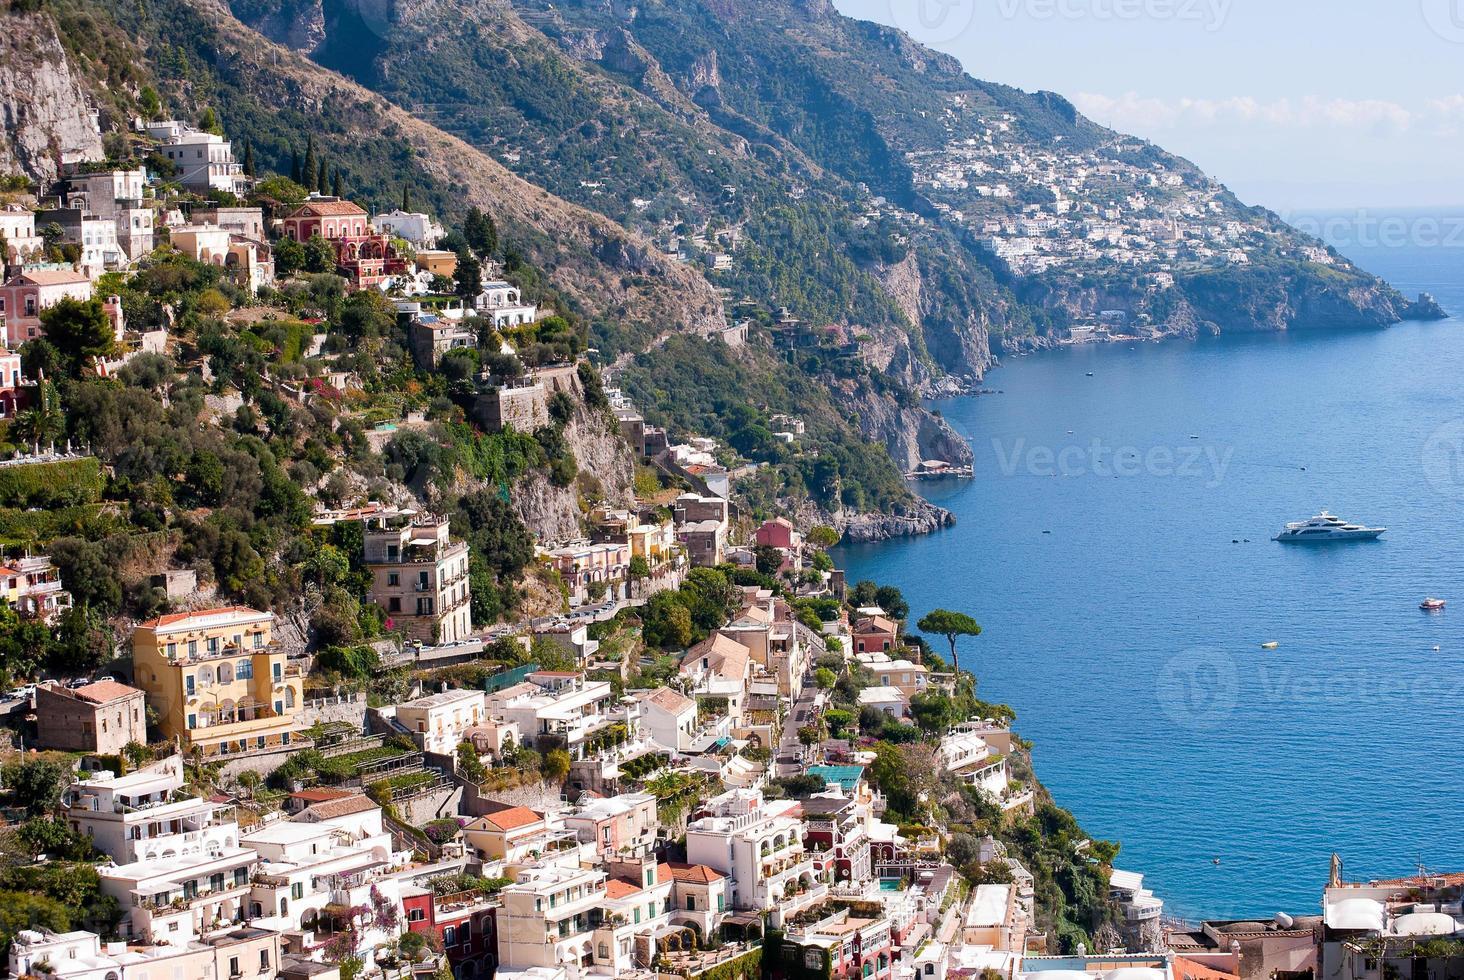 Positano, Amalfi Coast Italy photo